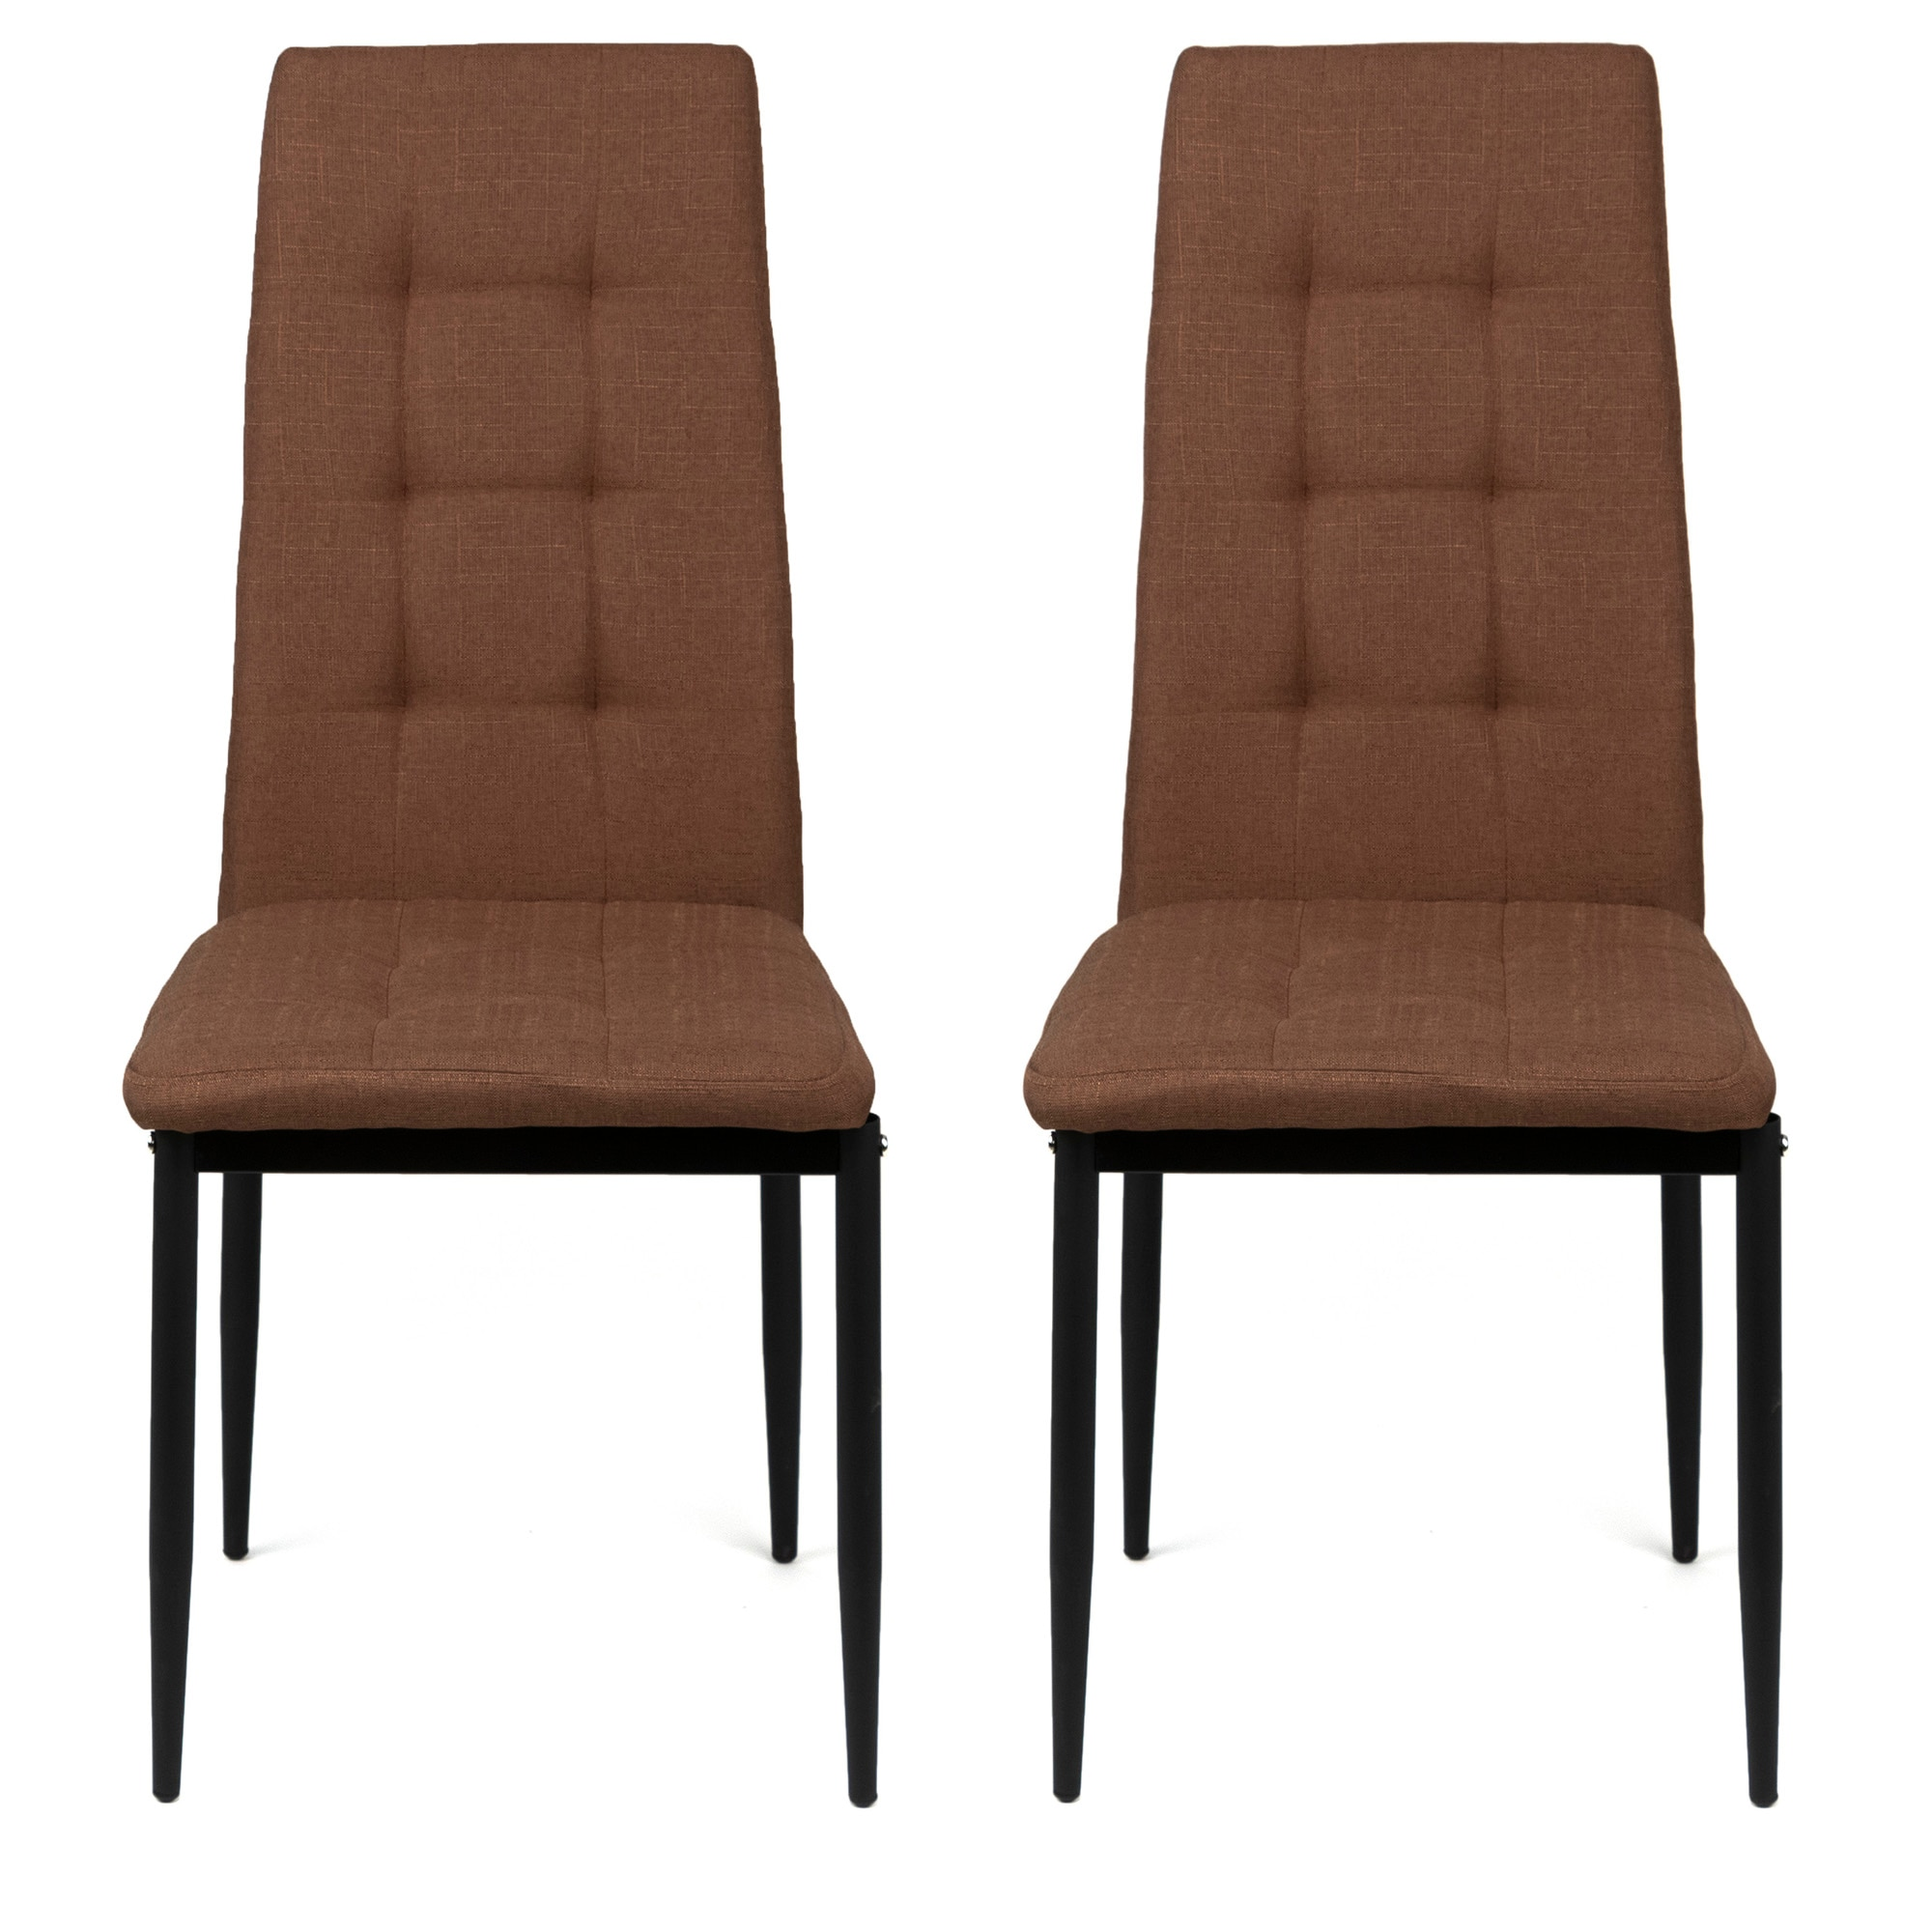 Fotografie Set 2 scaune bucatarie Kring Dublin, material textil, Maro deschis